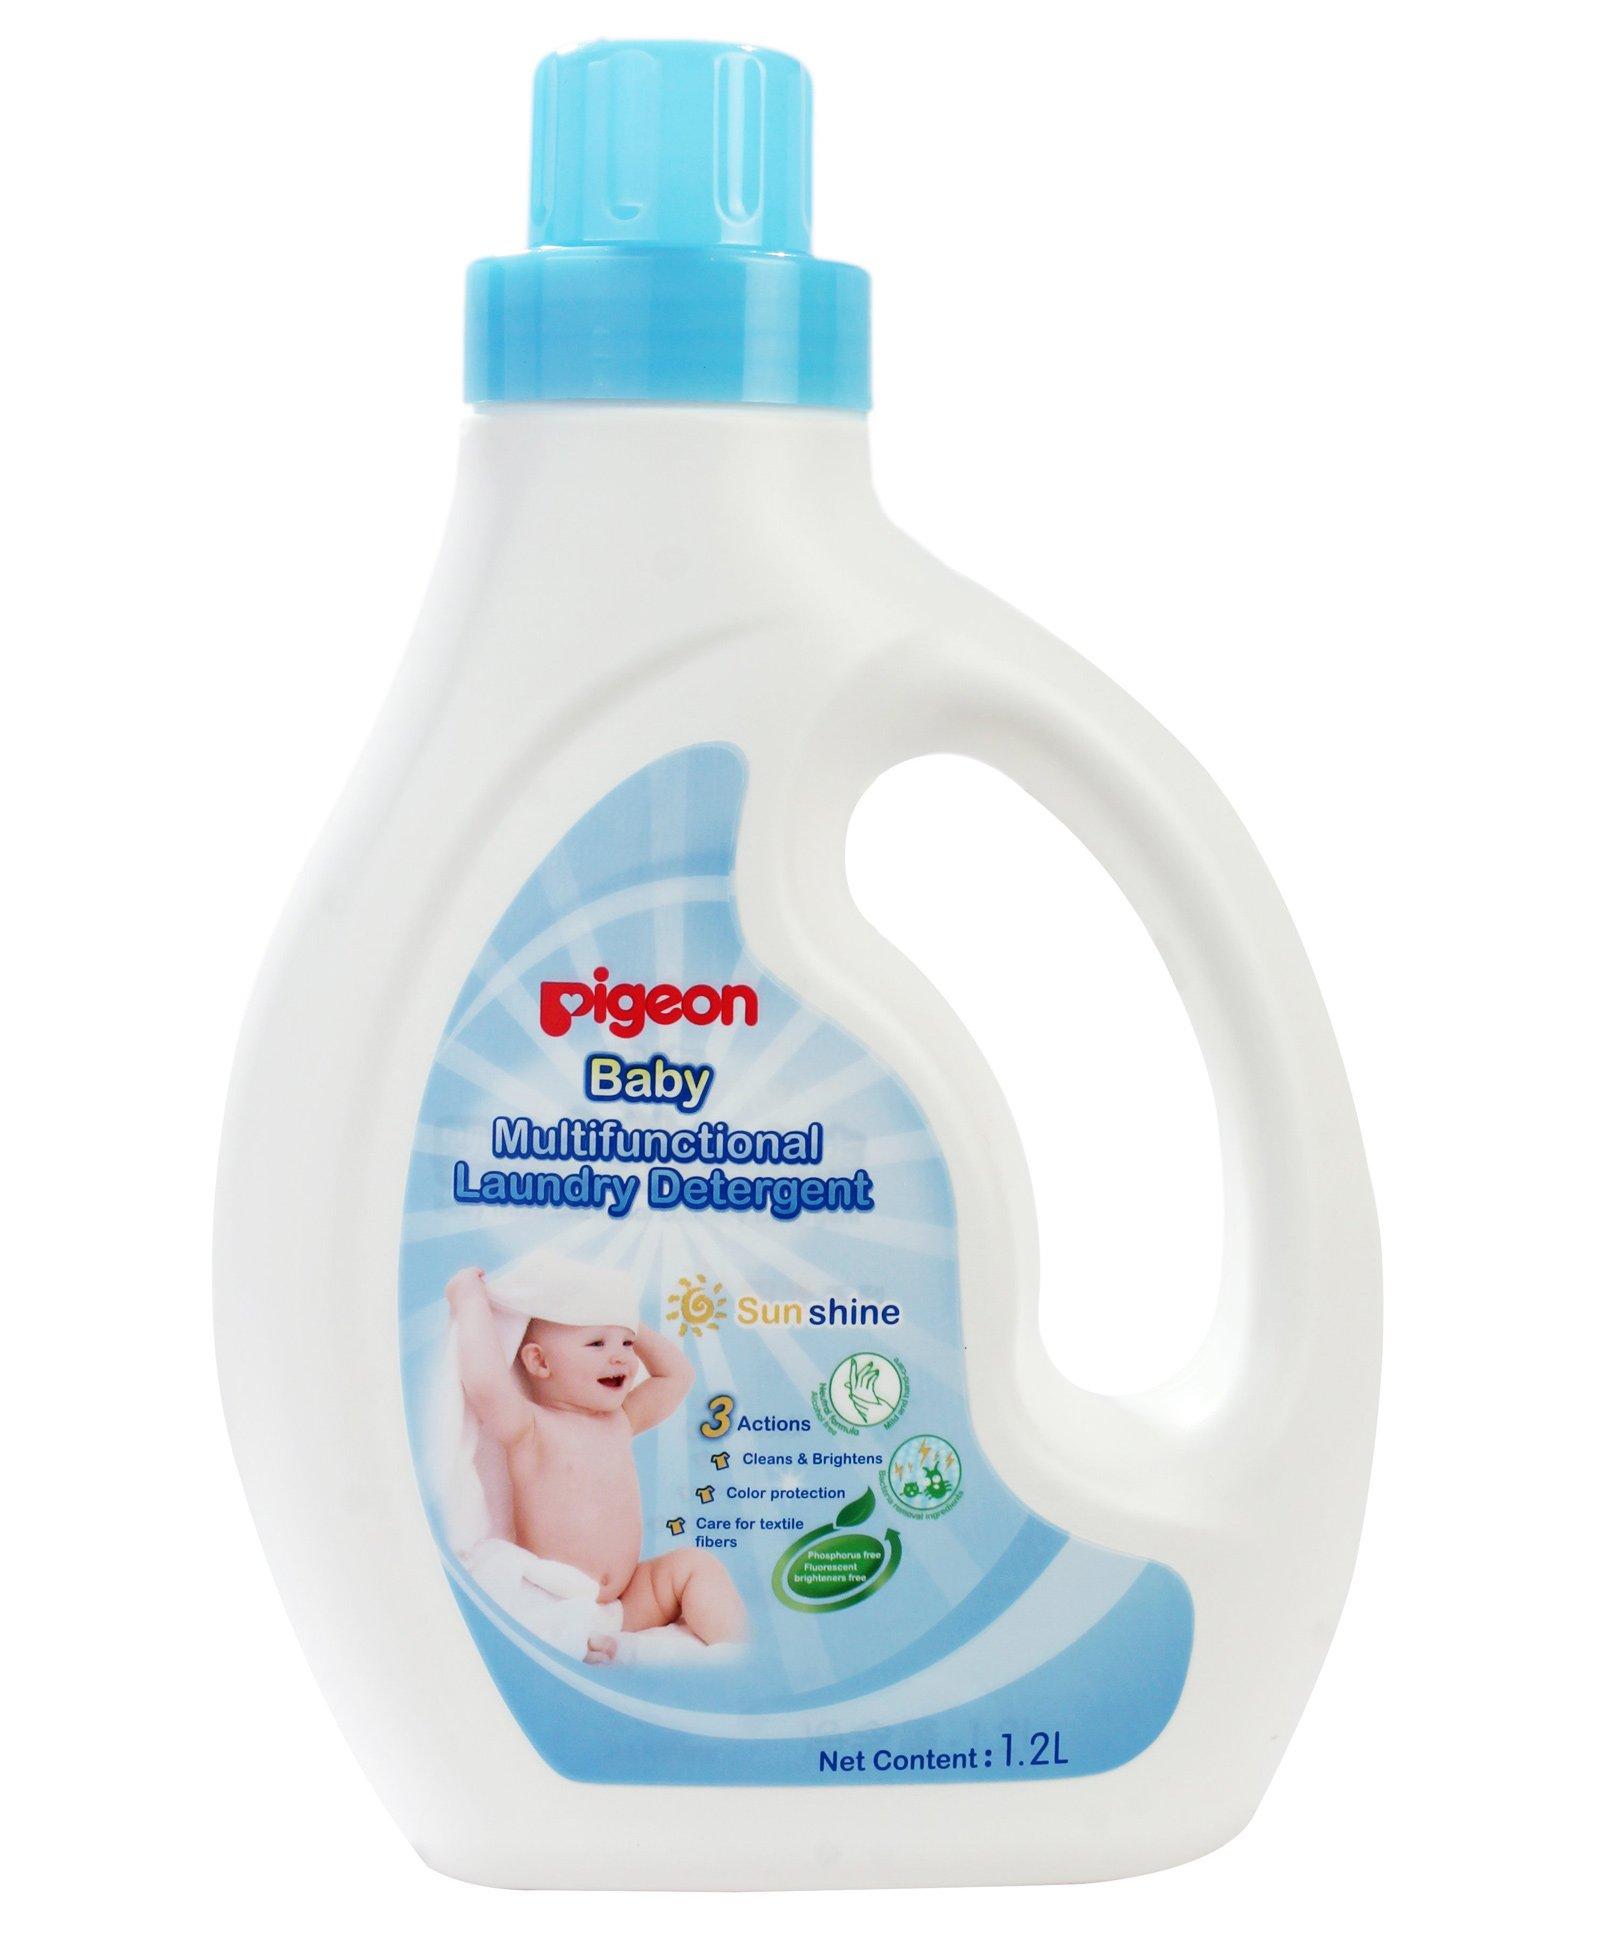 Pigeon Baby Multifunctional Laundry Detergent 1 2 Liter line in